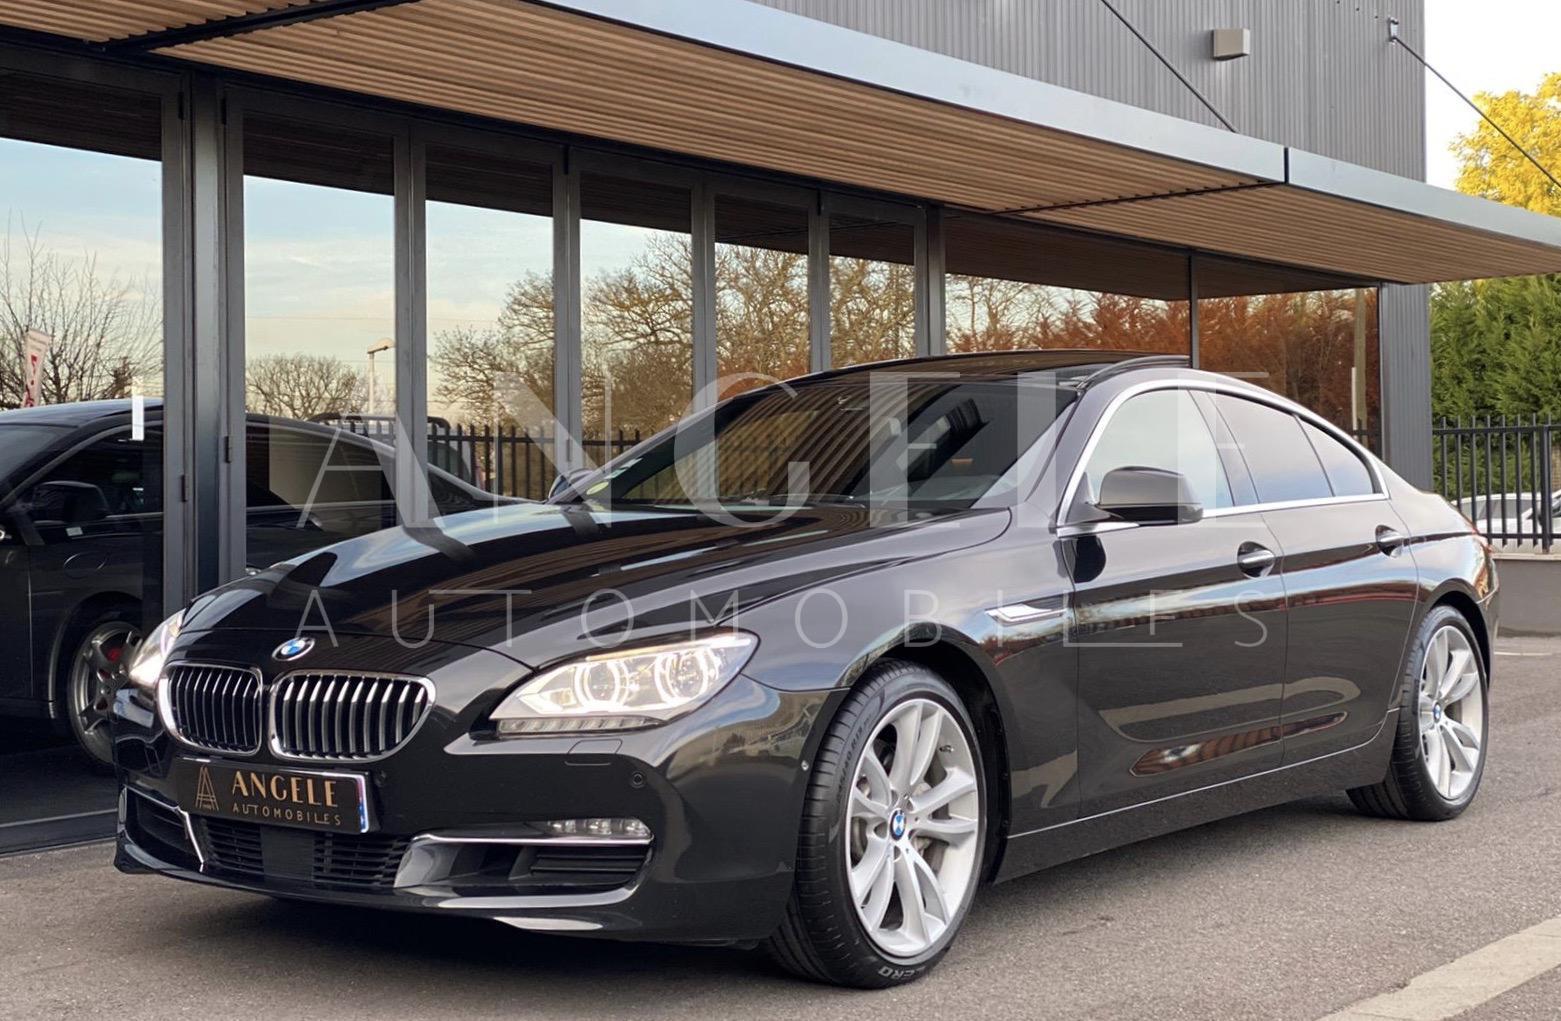 BMW 640D XDRIVE - Angelé Automobiles